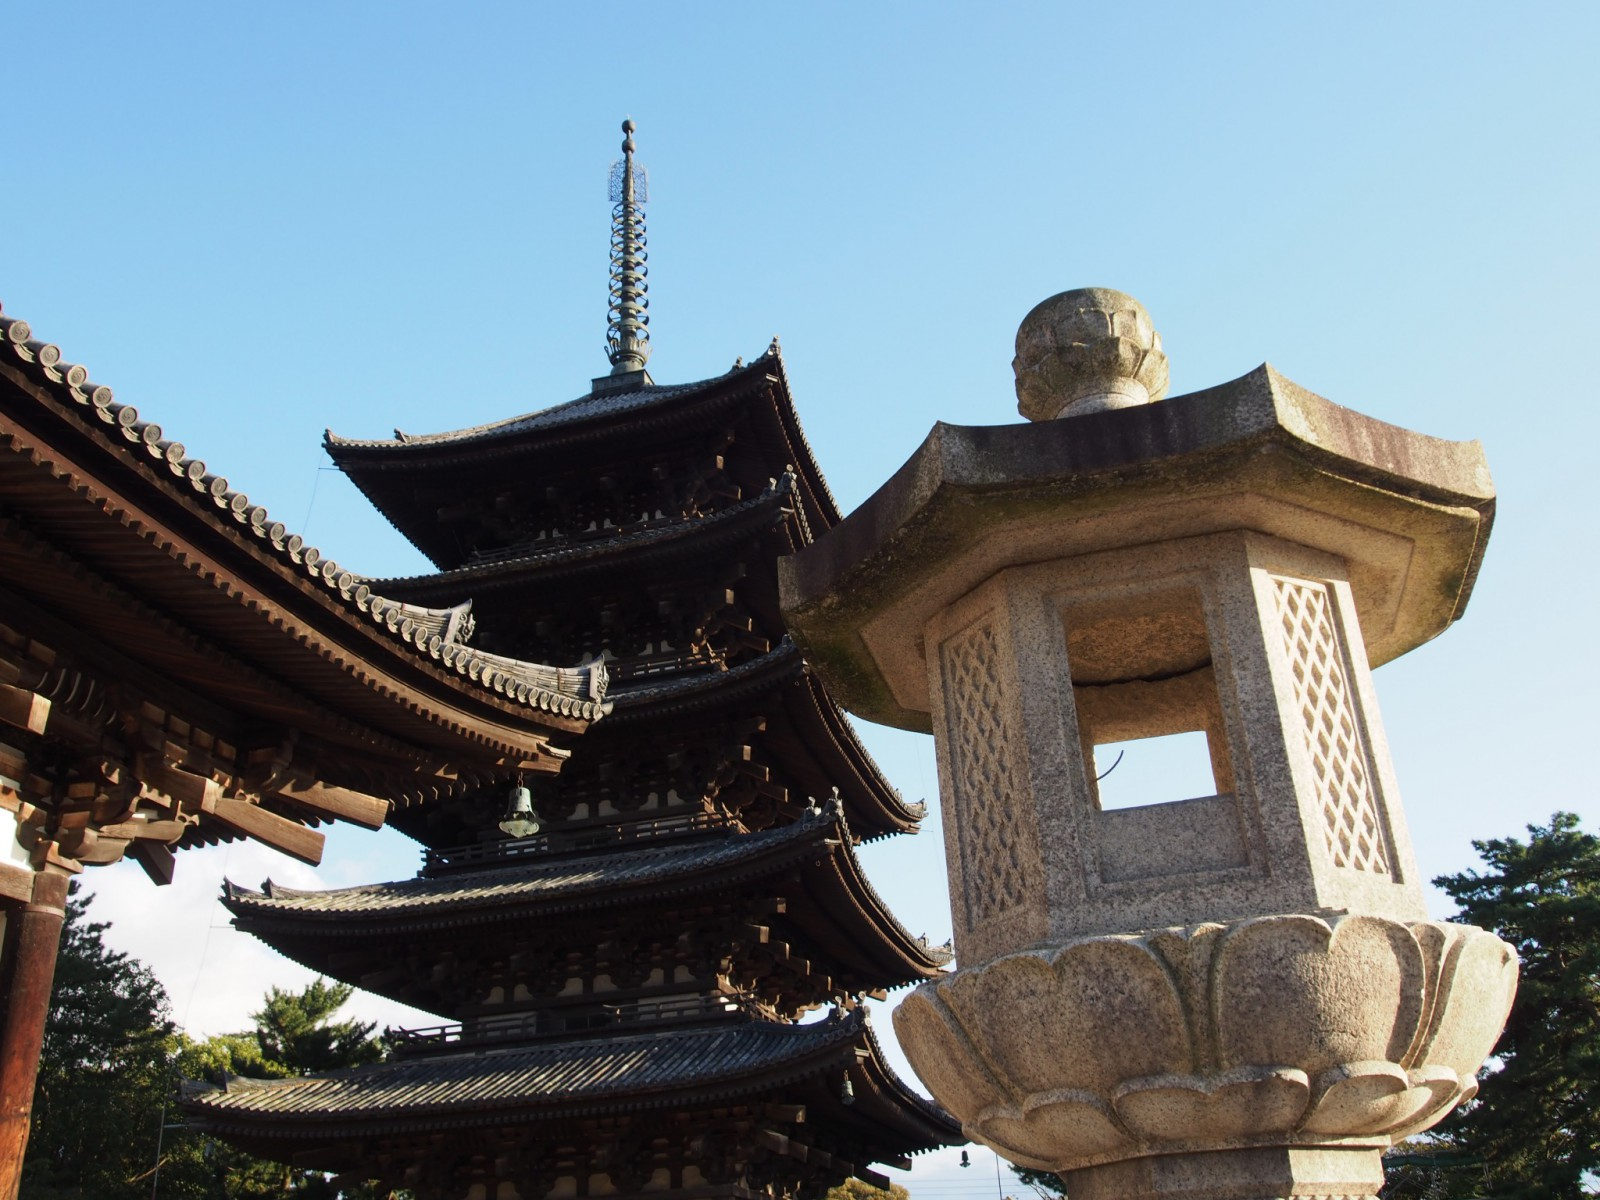 燈籠と五重塔と東金堂